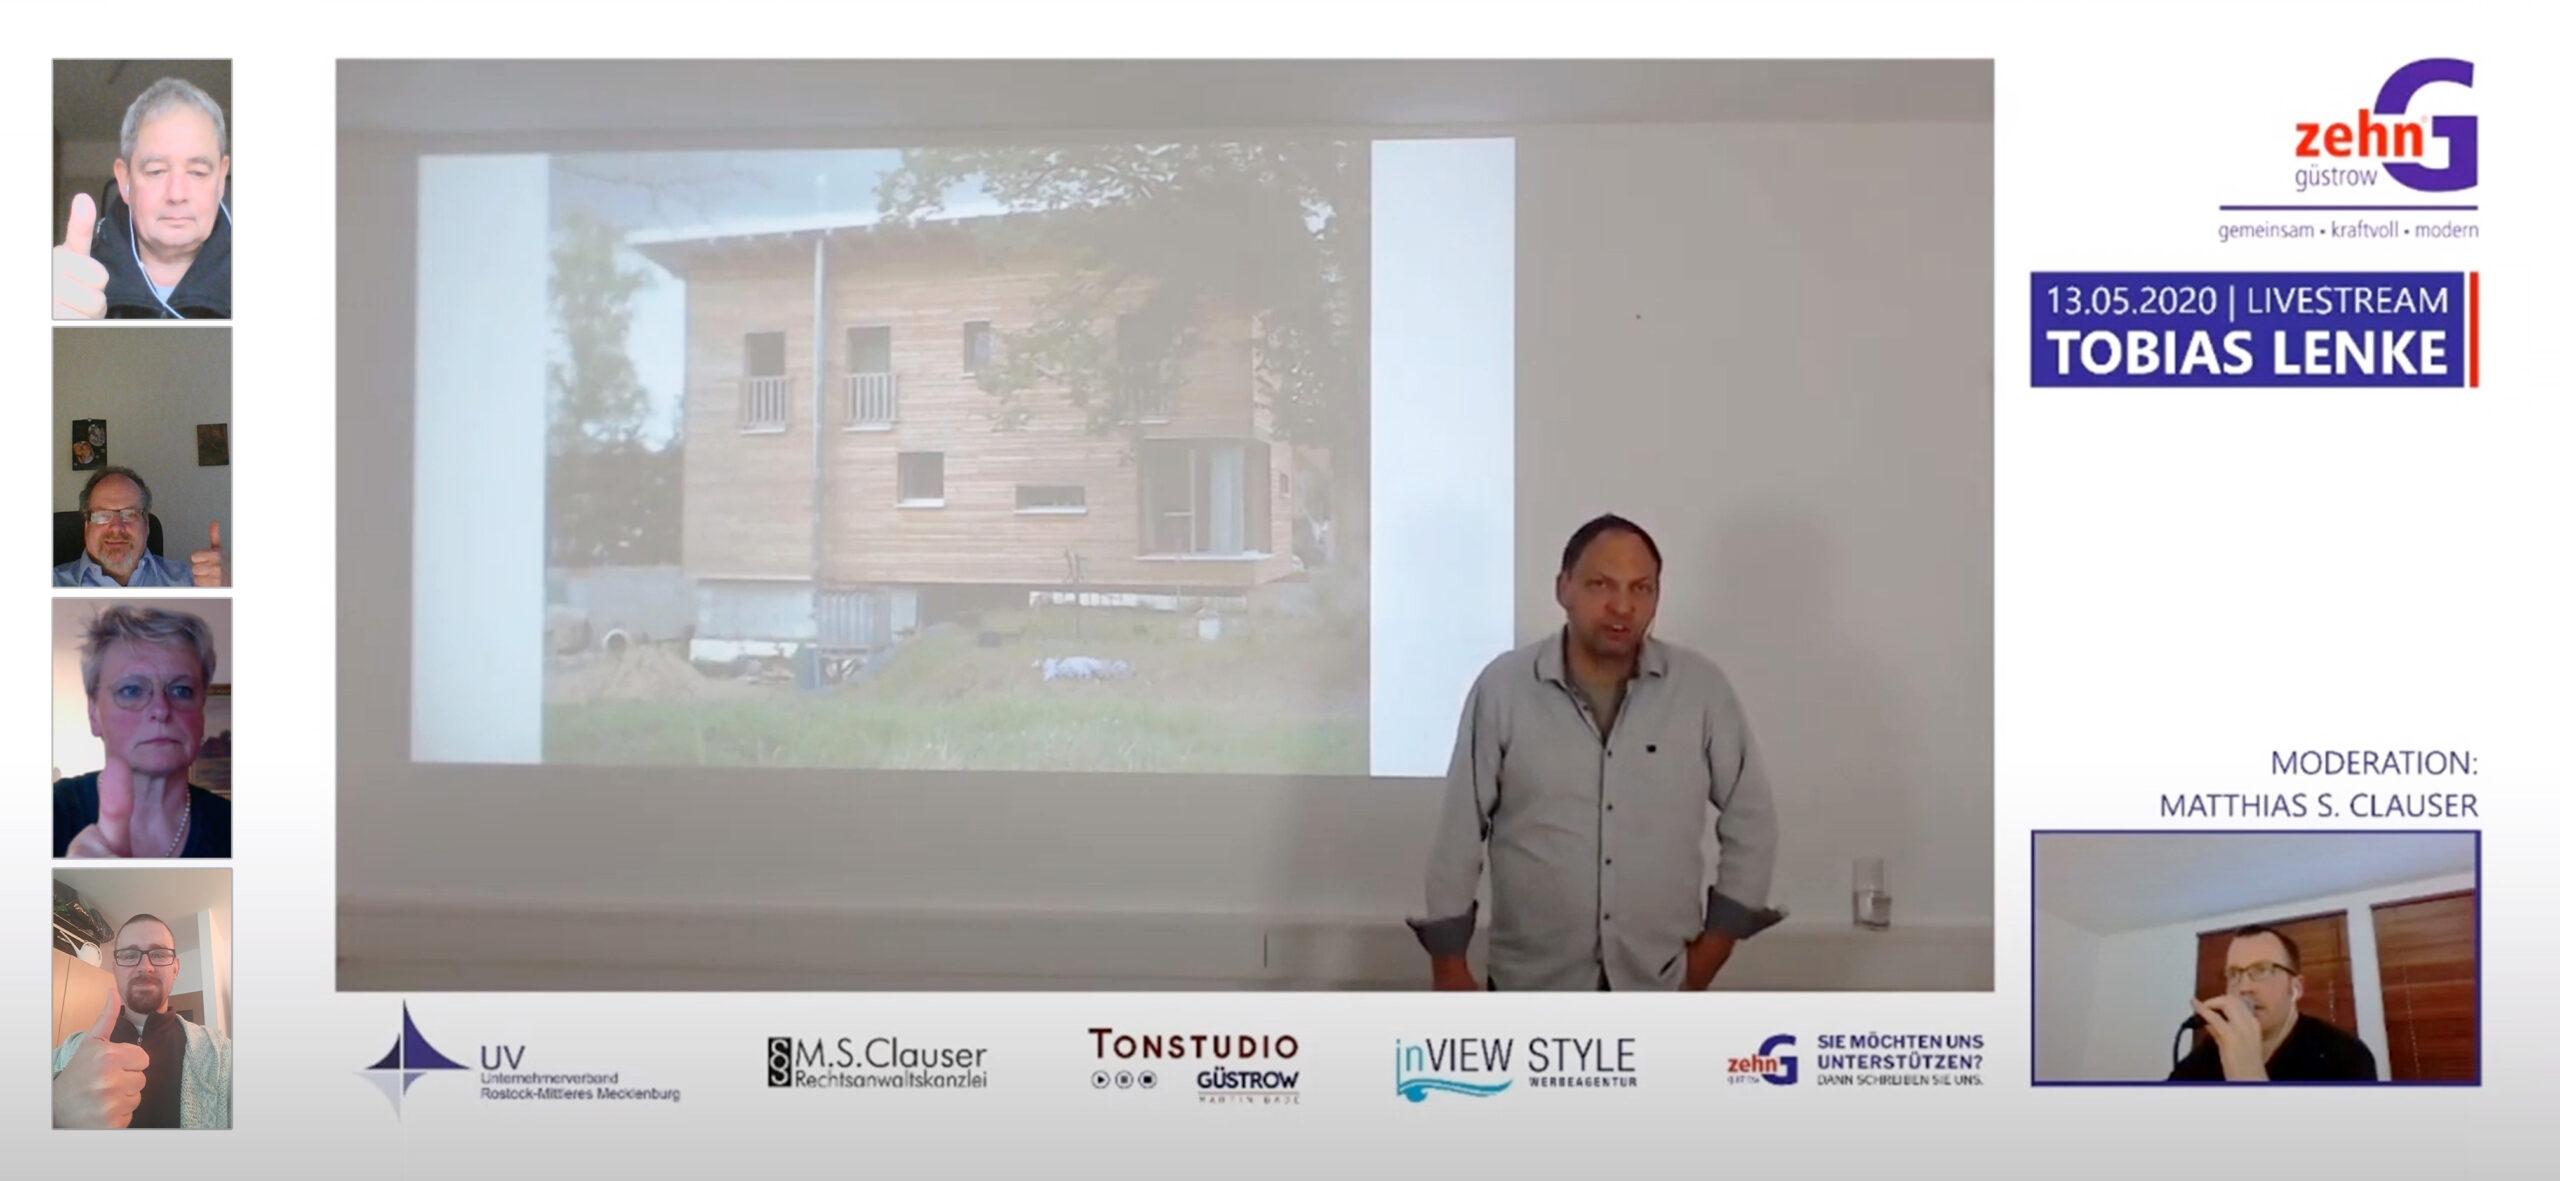 10G Vortrag - Tobias Lenke - Gruppenfoto